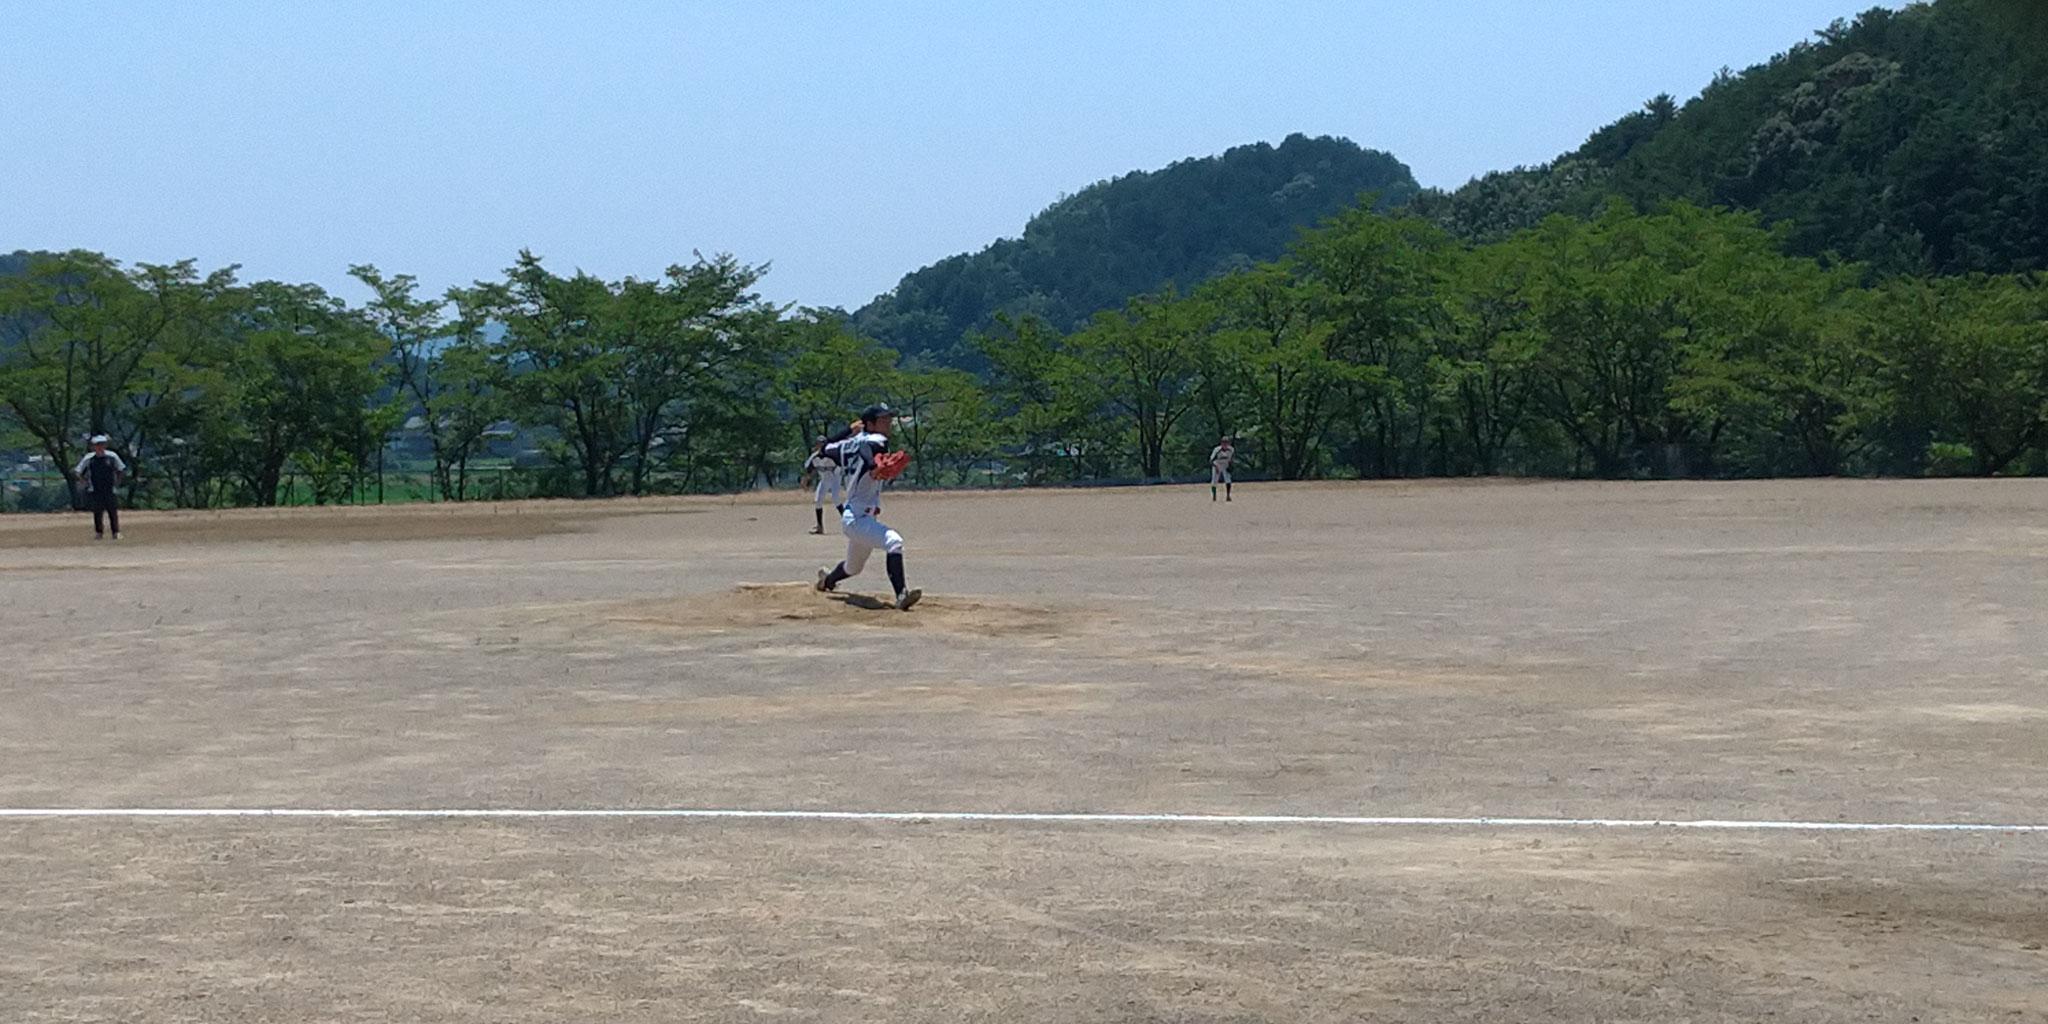 52 Segawa Nobuo